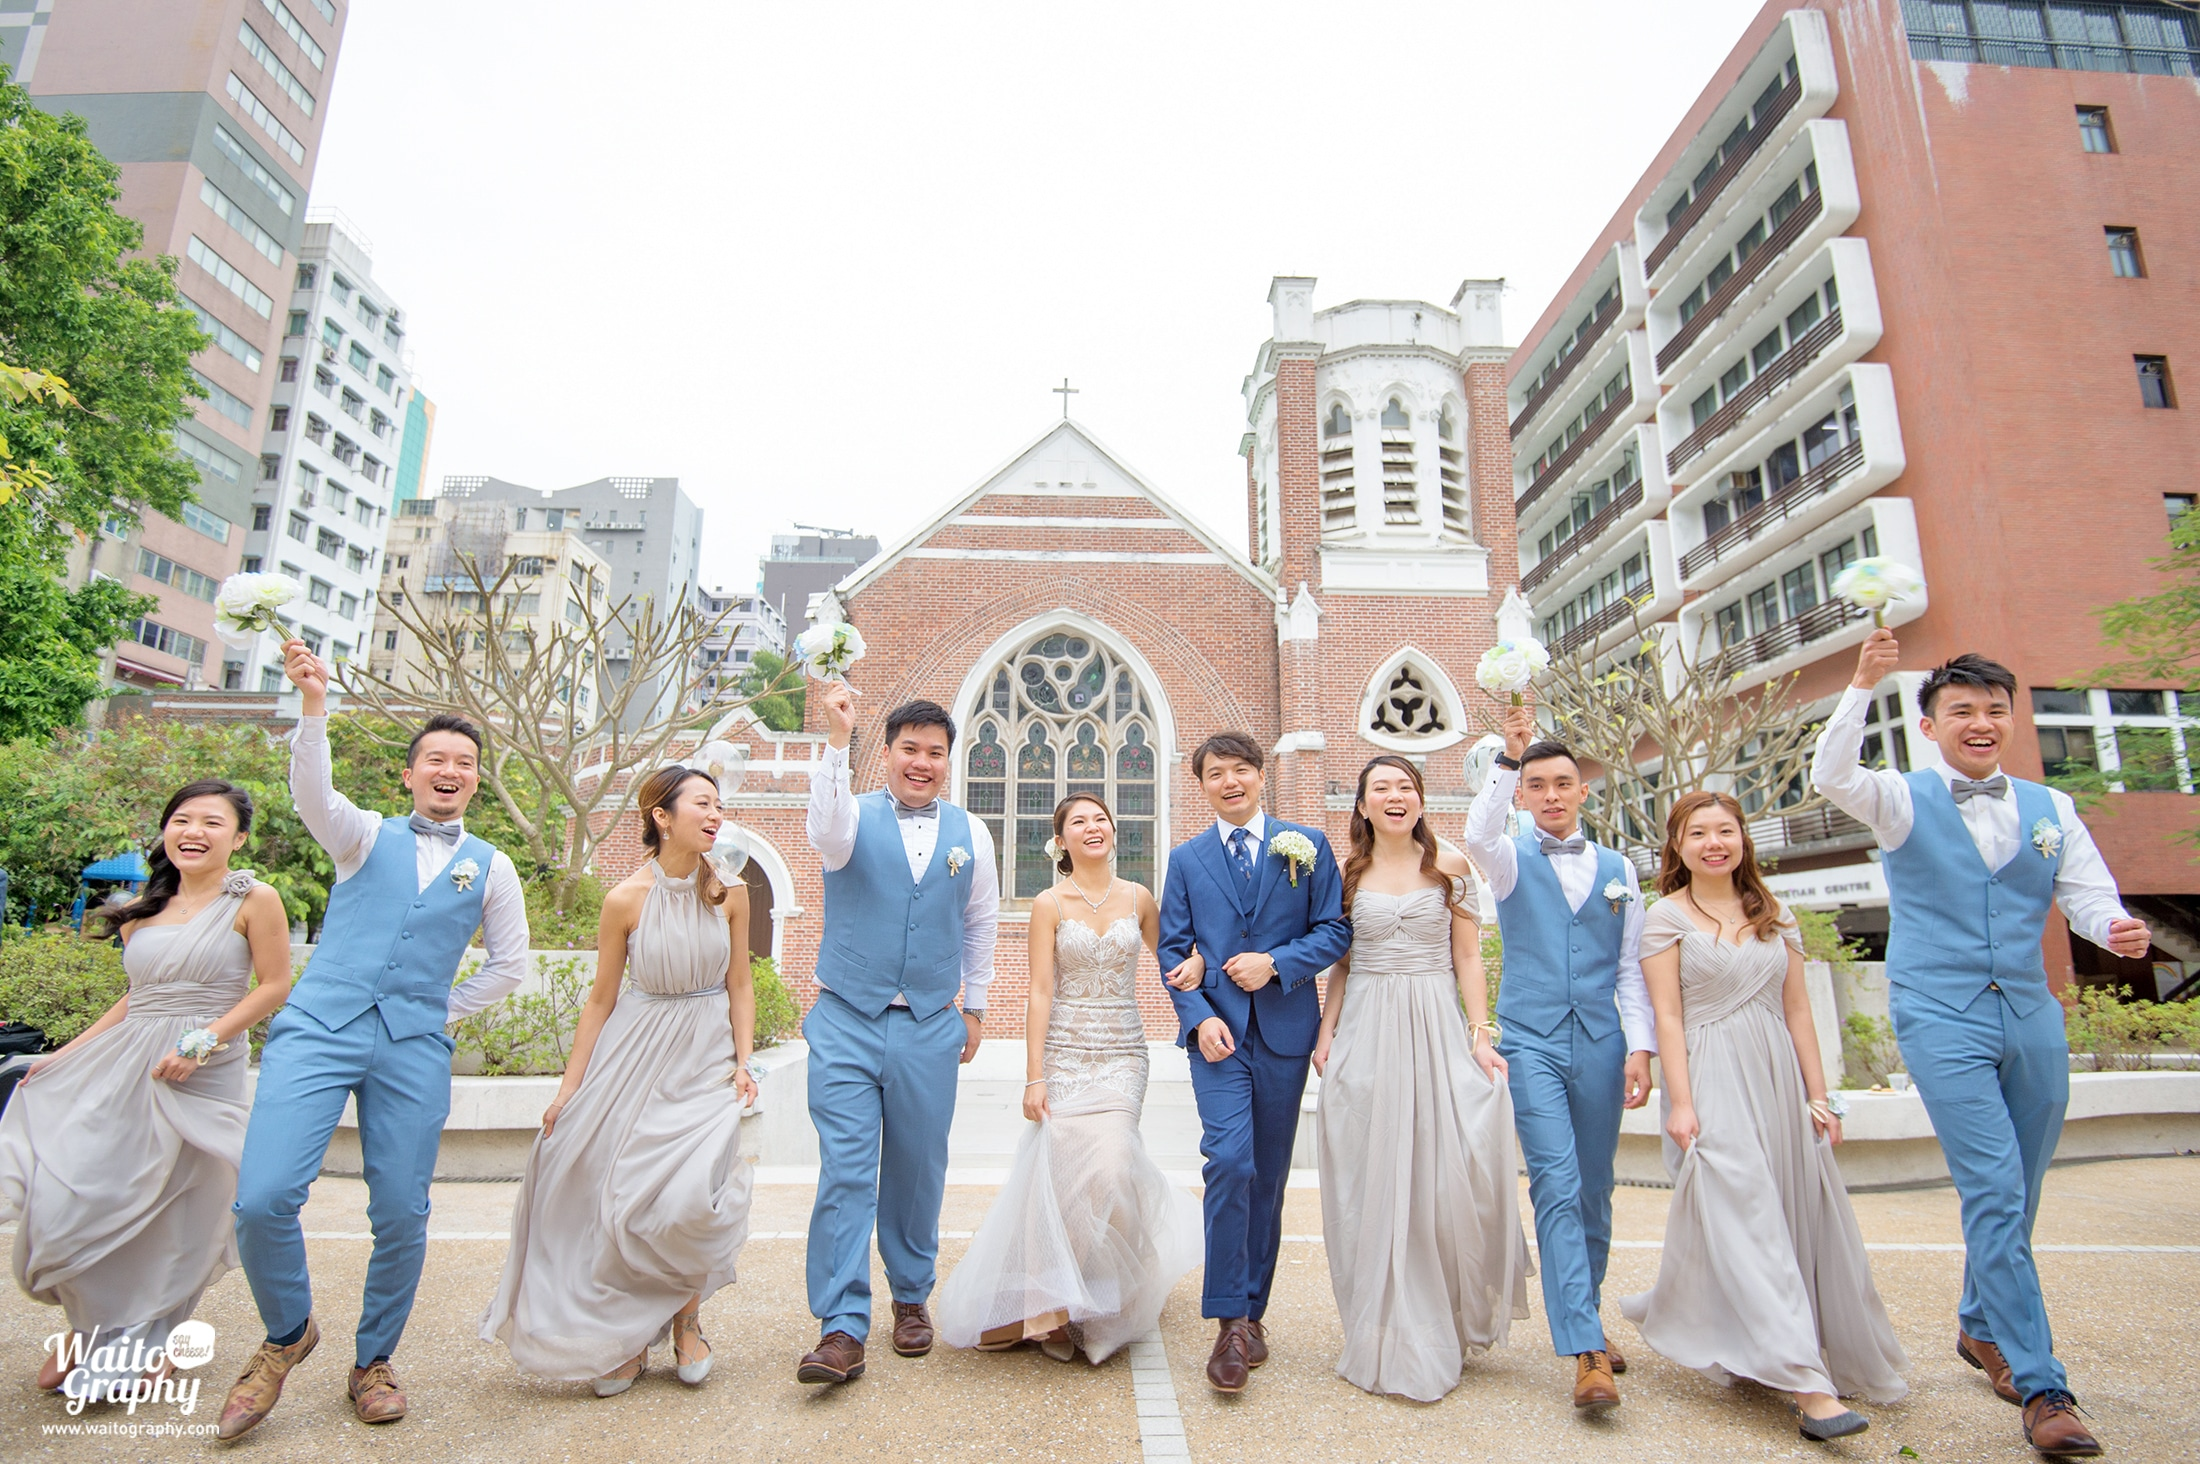 Katrina & Alex Wedding Day HK 聖安德烈堂 St. Andrew's Church Kowloon